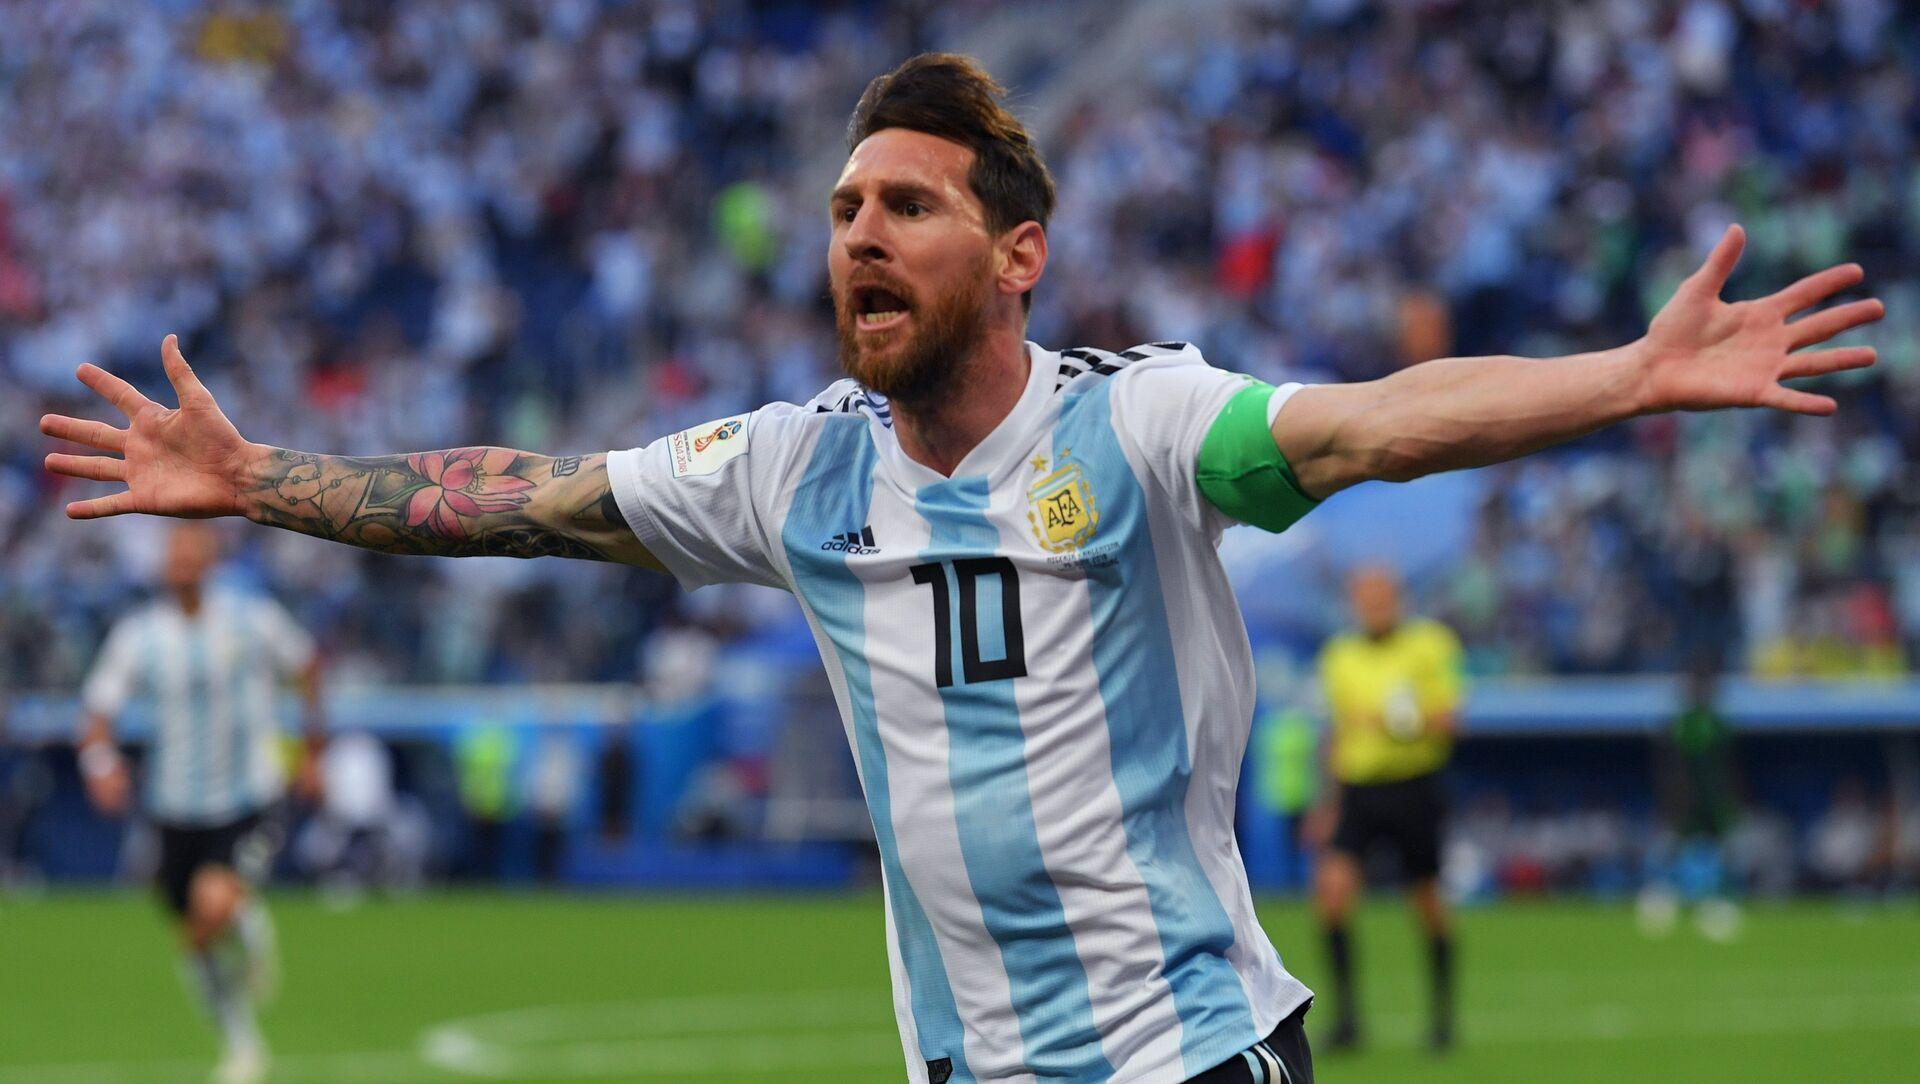 Lionel Messi celebra un goal - Sputnik Italia, 1920, 01.02.2021